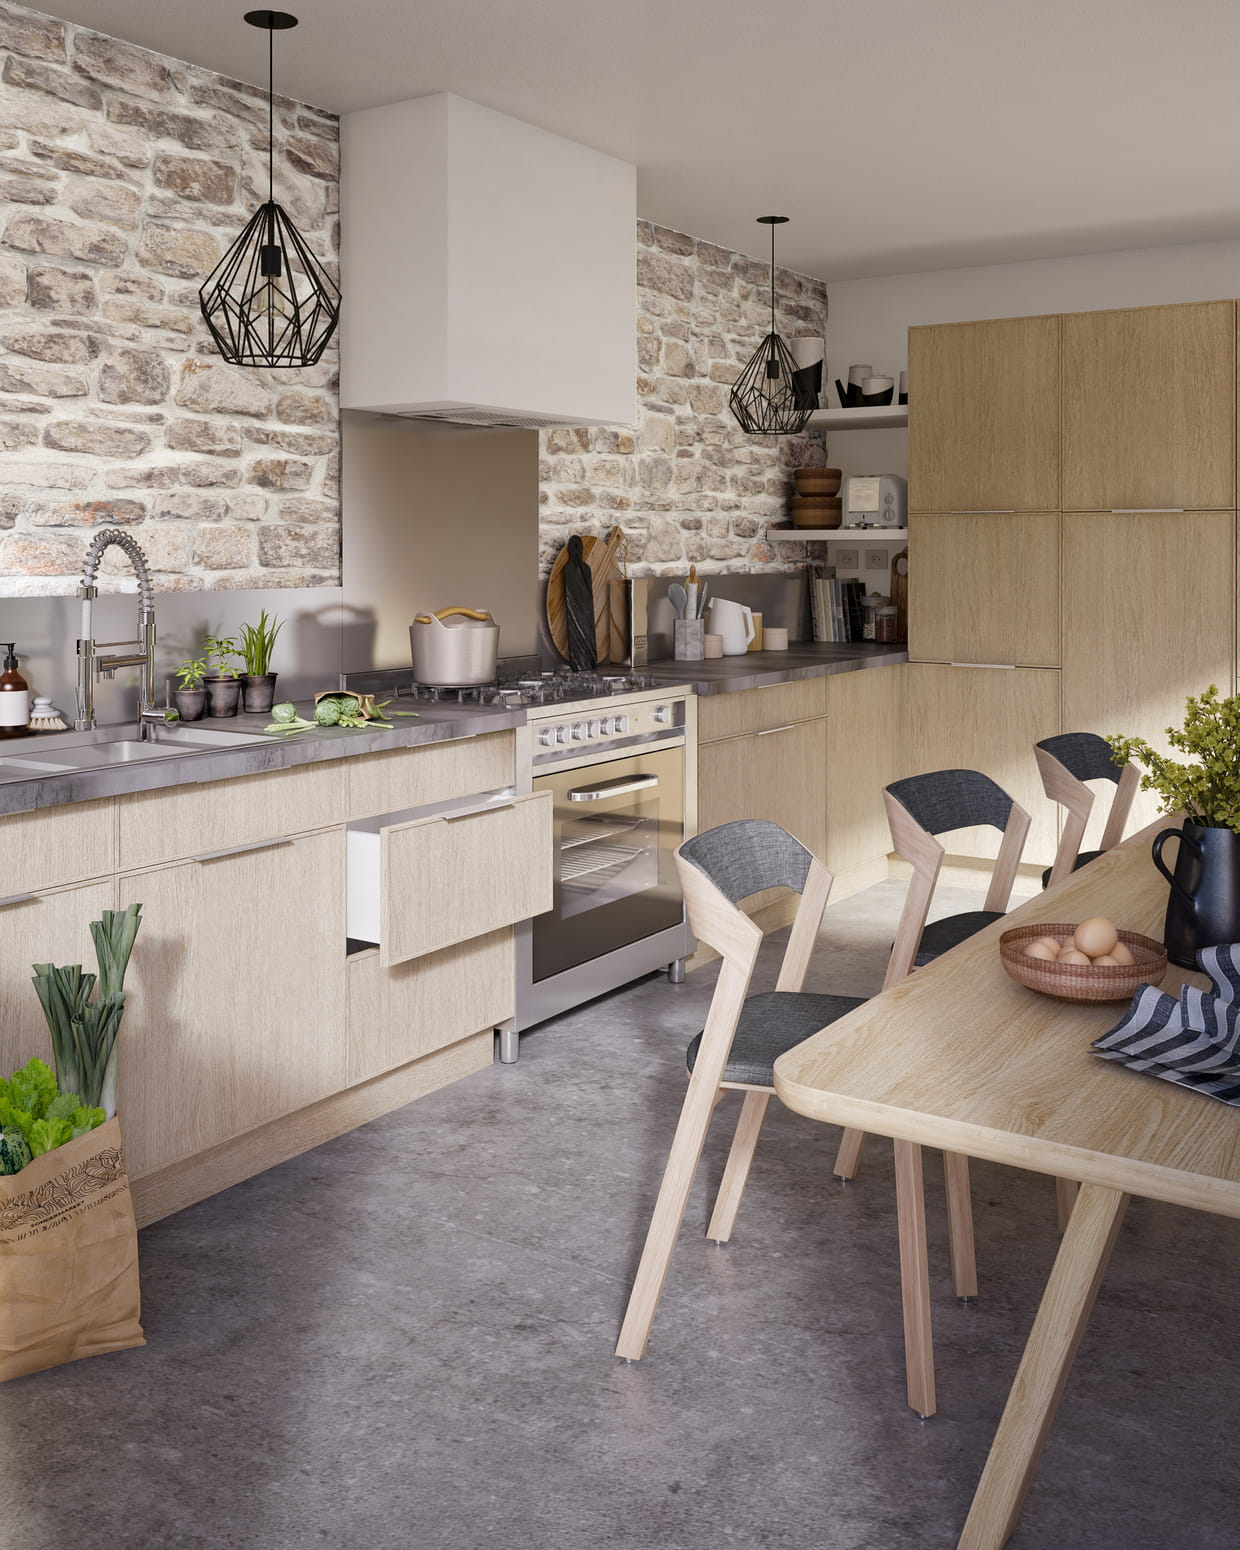 cuisine cooke lewis kontour de castorama. Black Bedroom Furniture Sets. Home Design Ideas